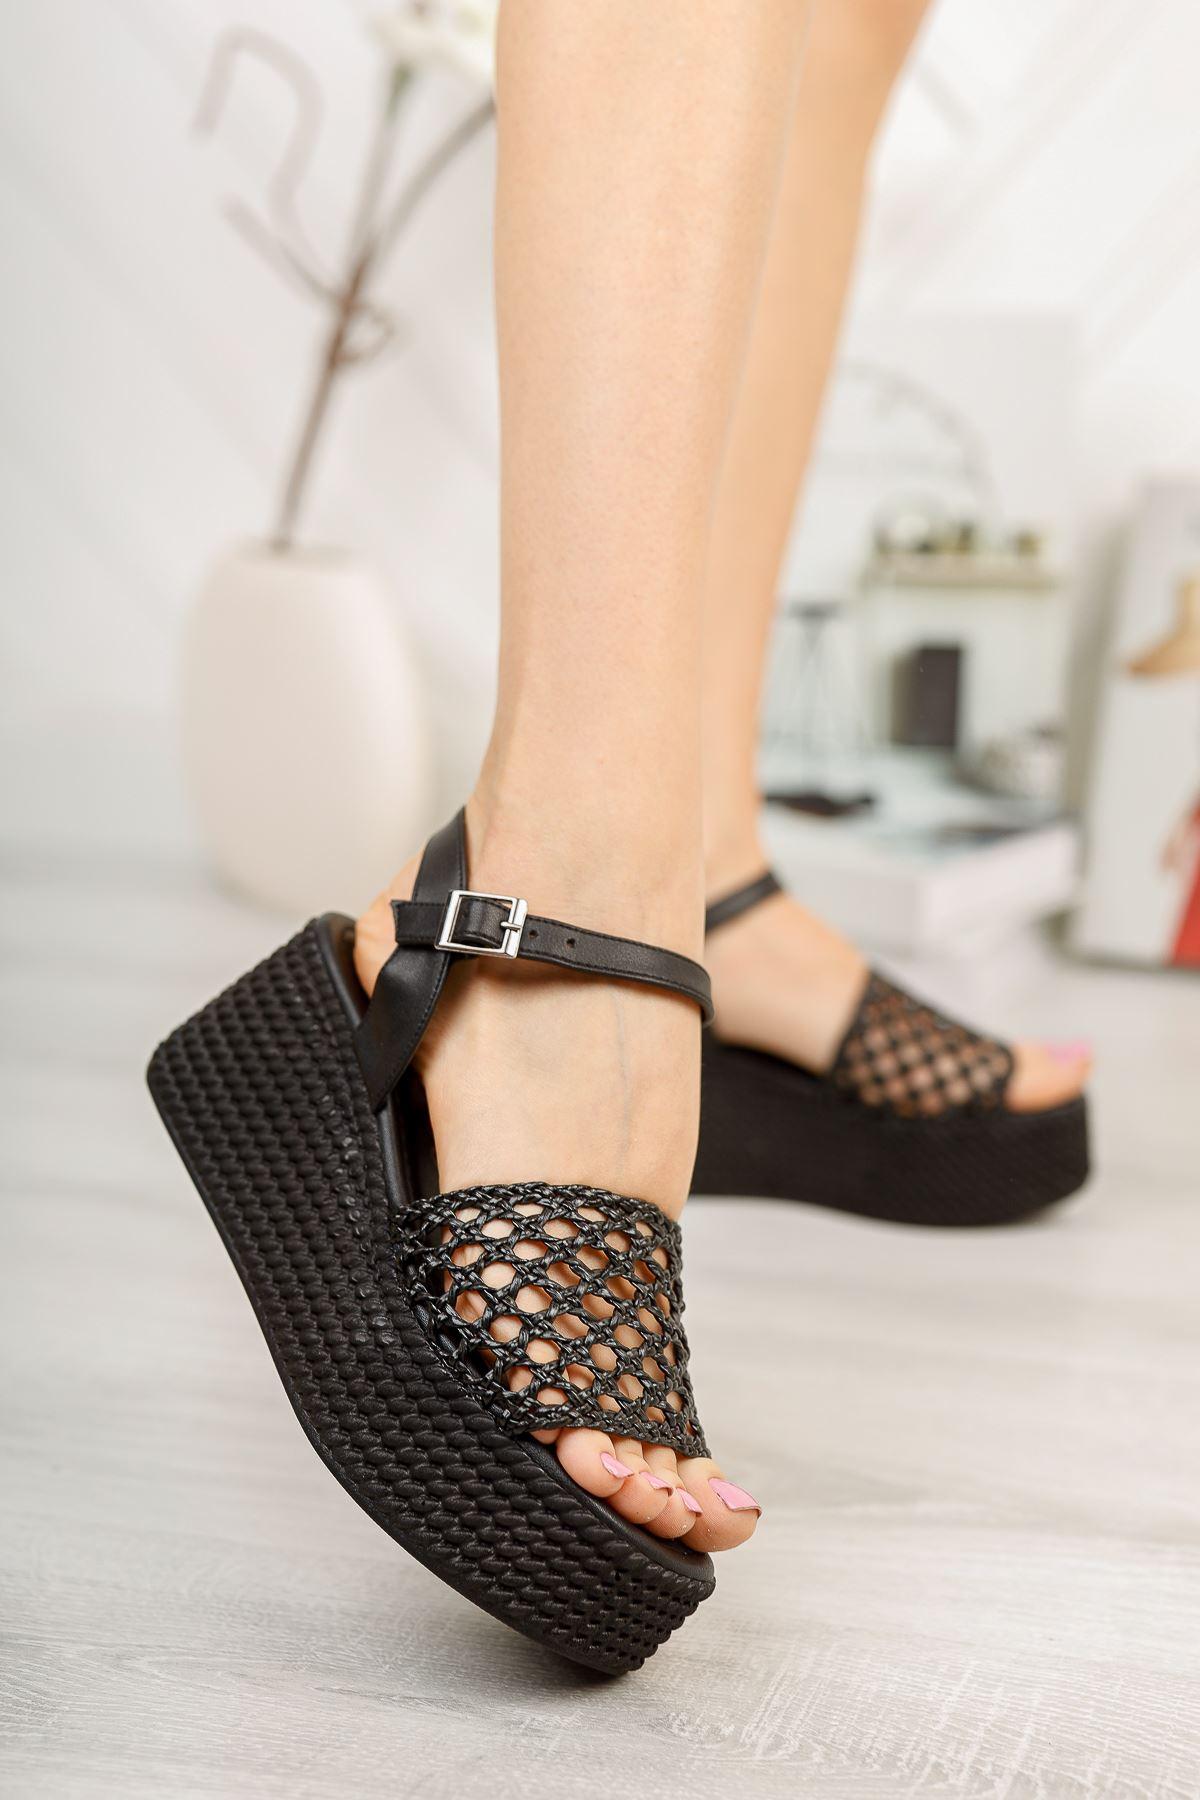 Siyah Örgü Dolgu Topuklu Ayakkabı